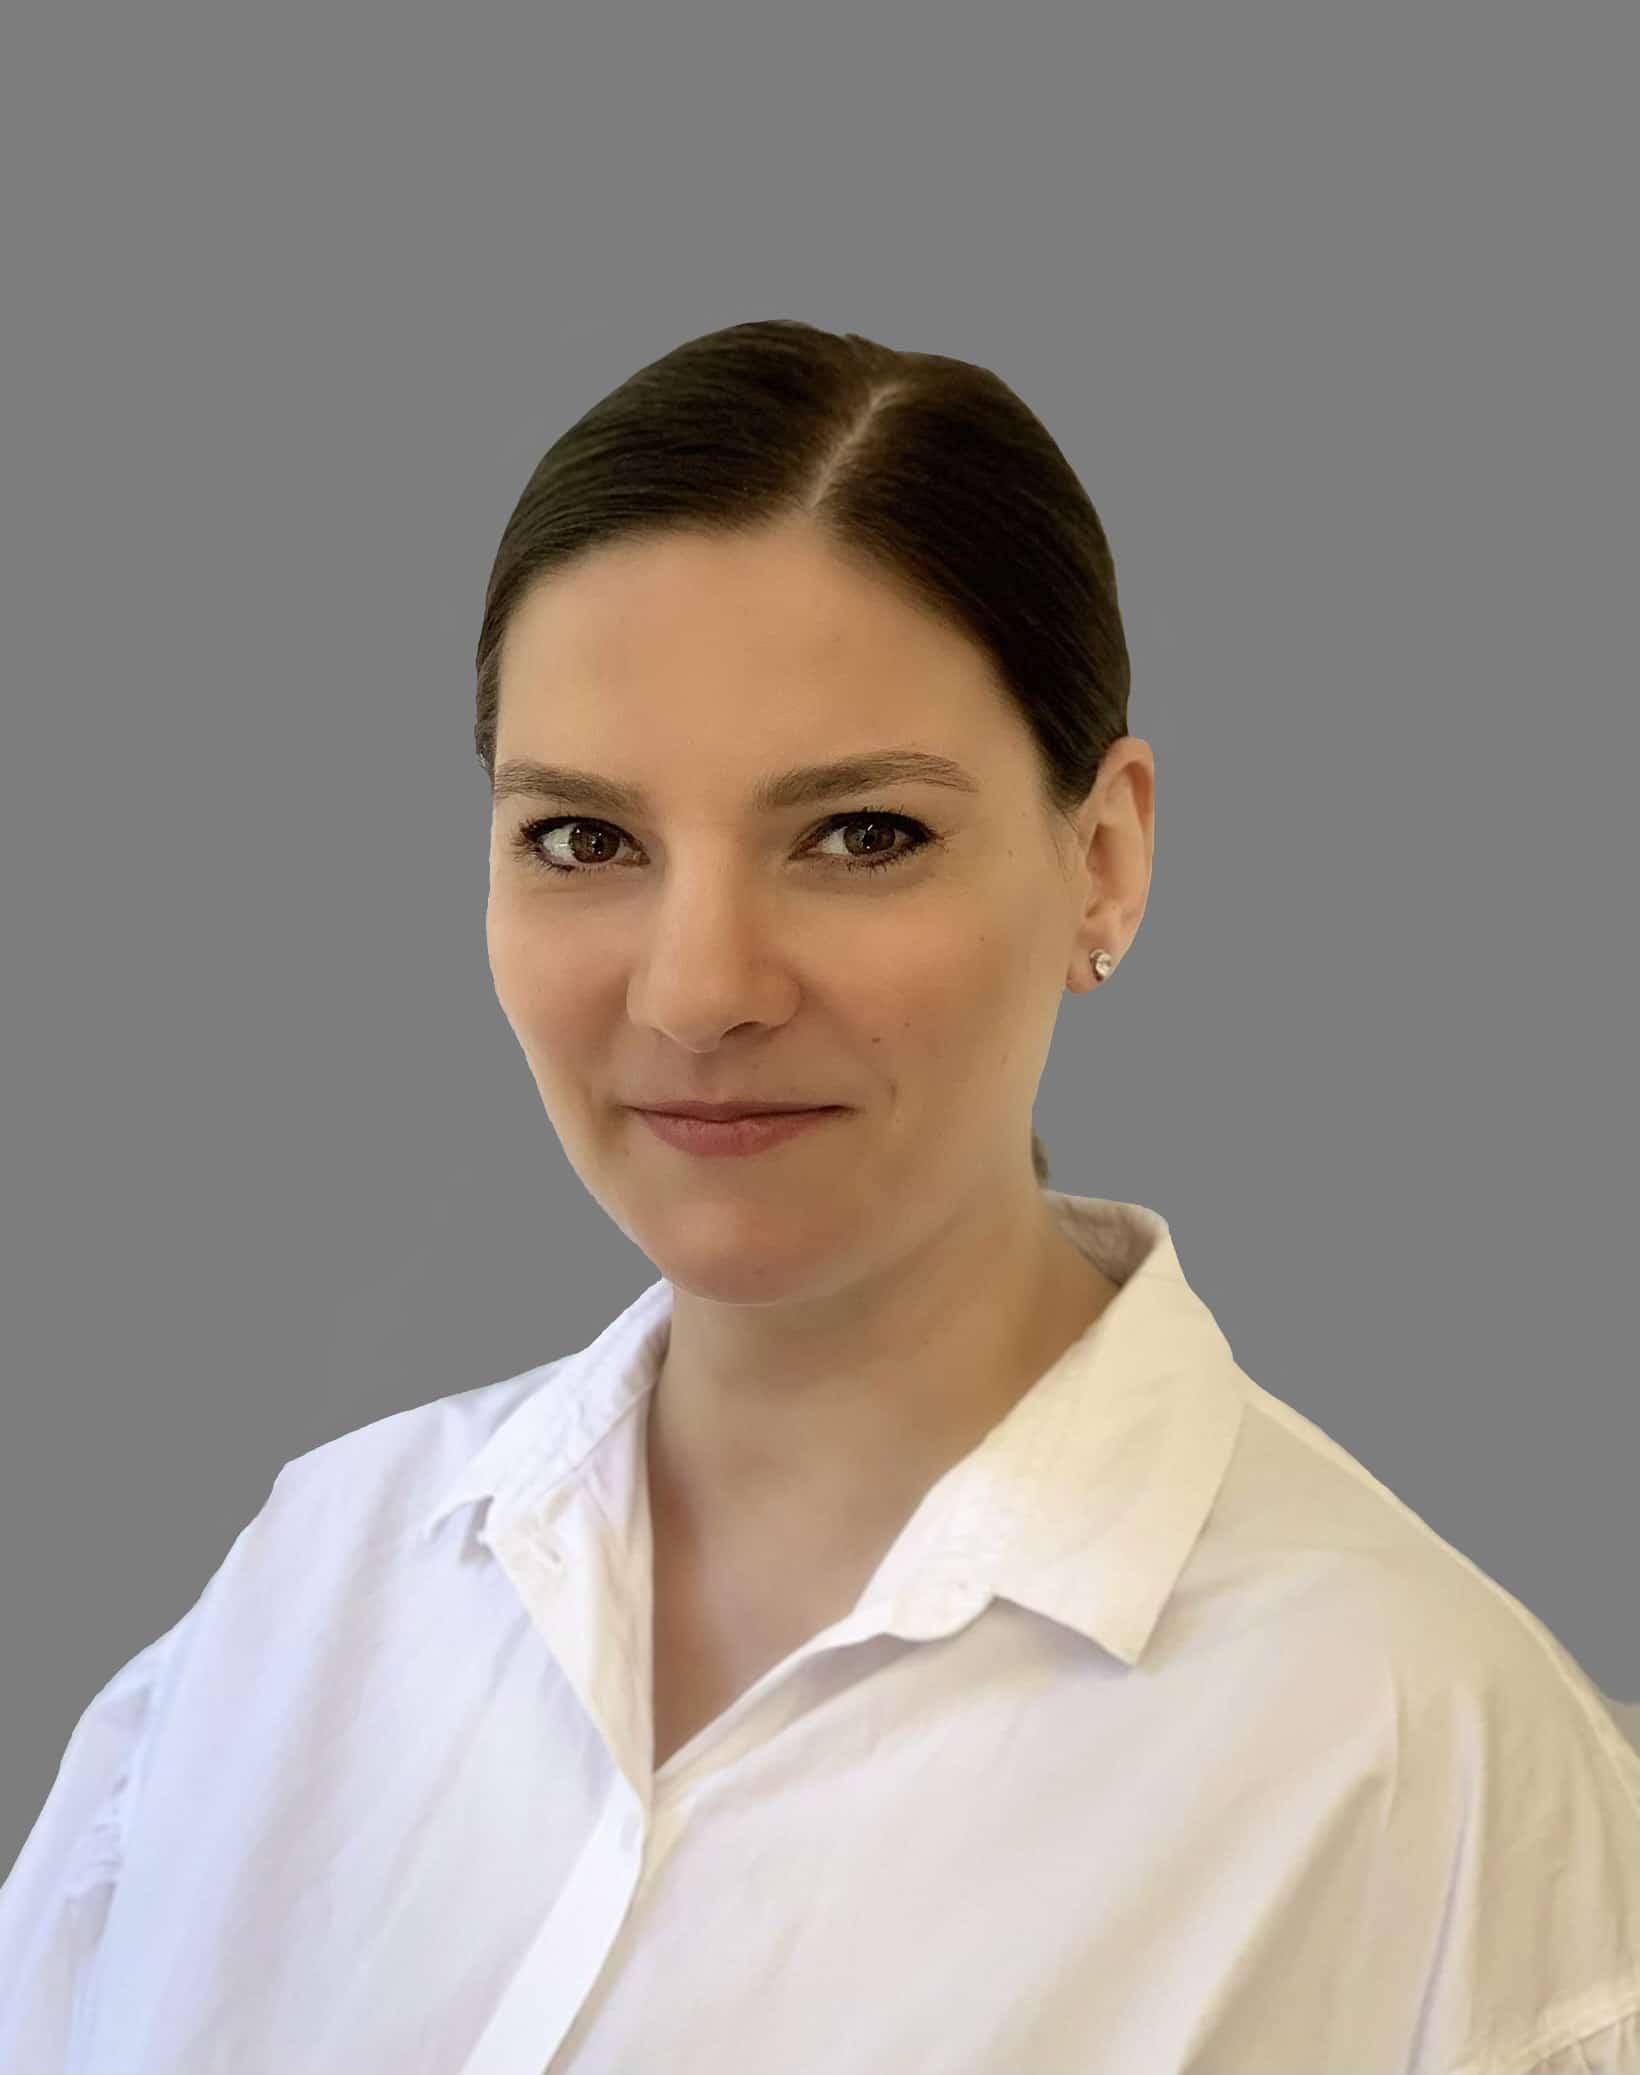 Dr. Váraljai Vanda